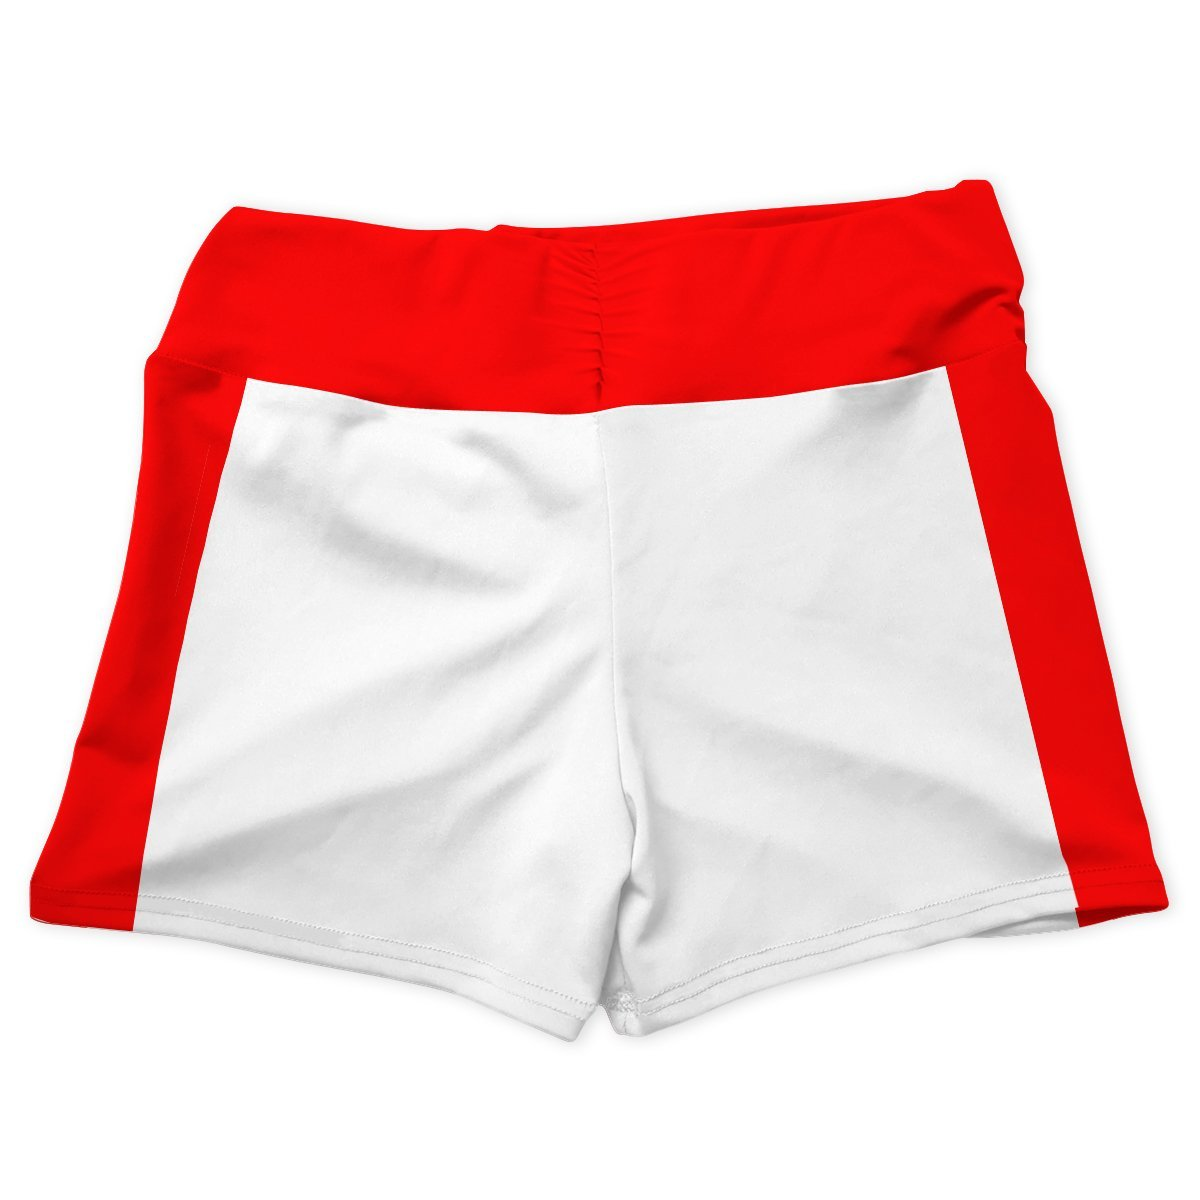 saitama oppai active wear set 526219 - Anime Swimsuits